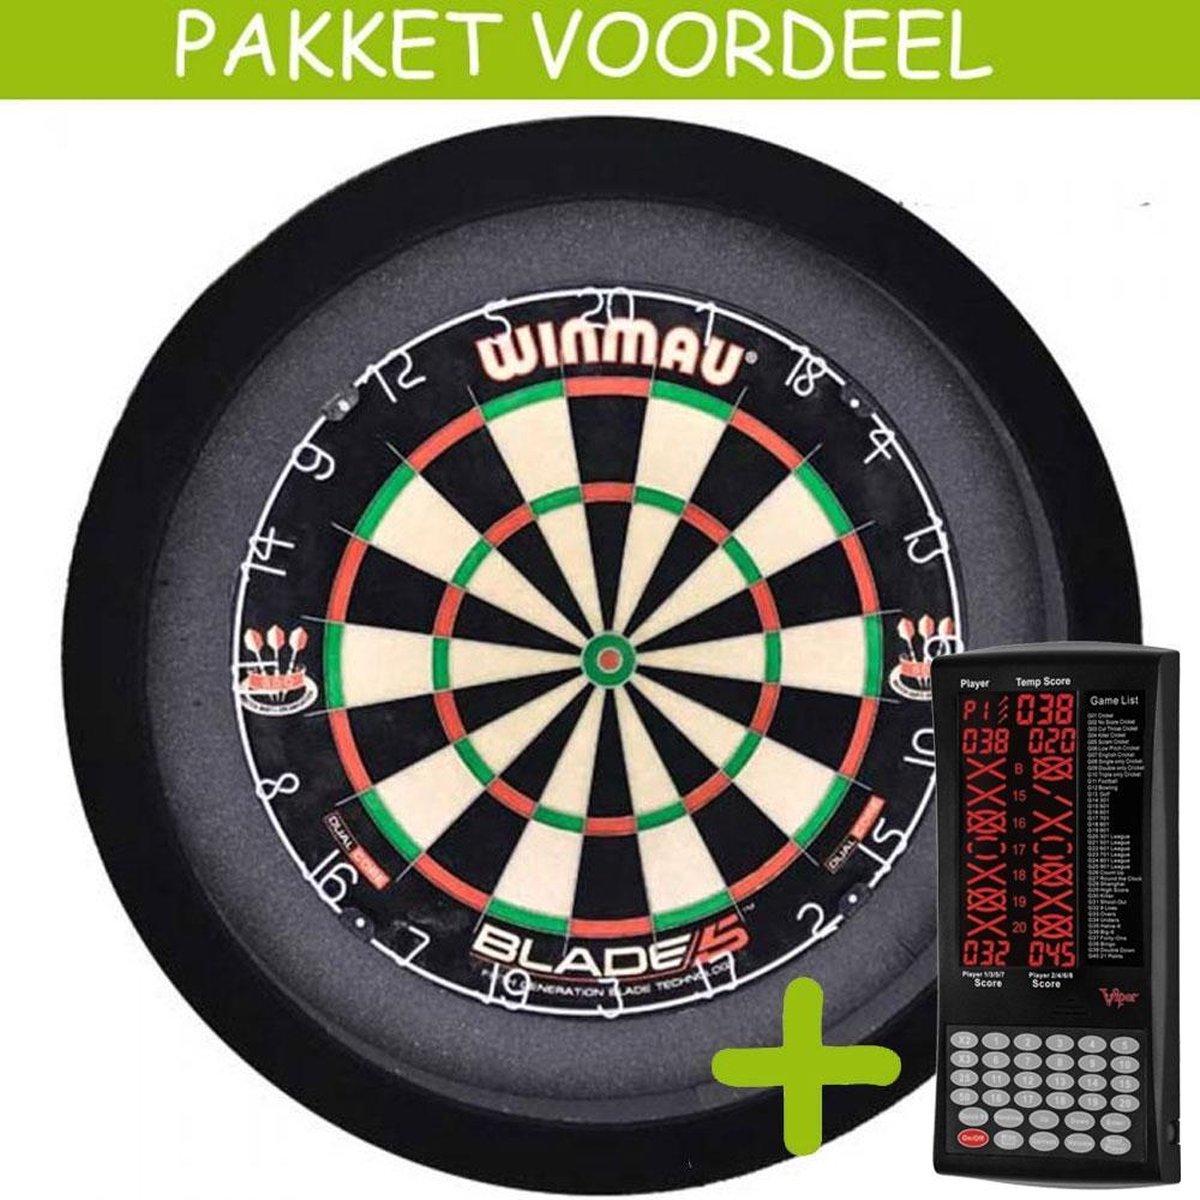 Elektronisch Dart Scorebord VoordeelPakket (Viper ) - Blade 5 - Dartbordverlichting Basic (Zwart)